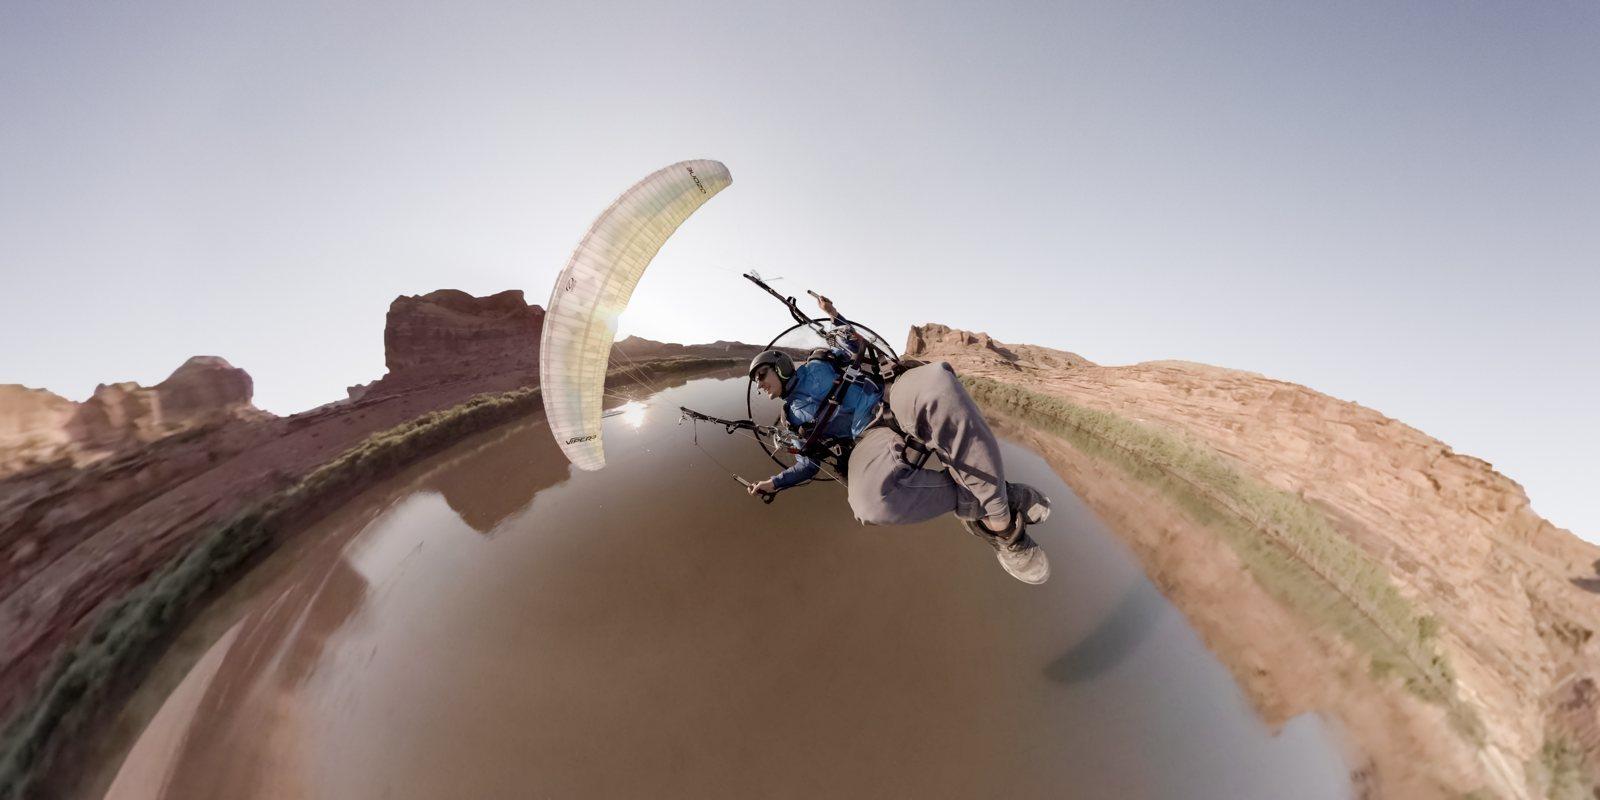 Панорамная камера GoPro Fusion 360 (CHDHZ-103) на парашюте